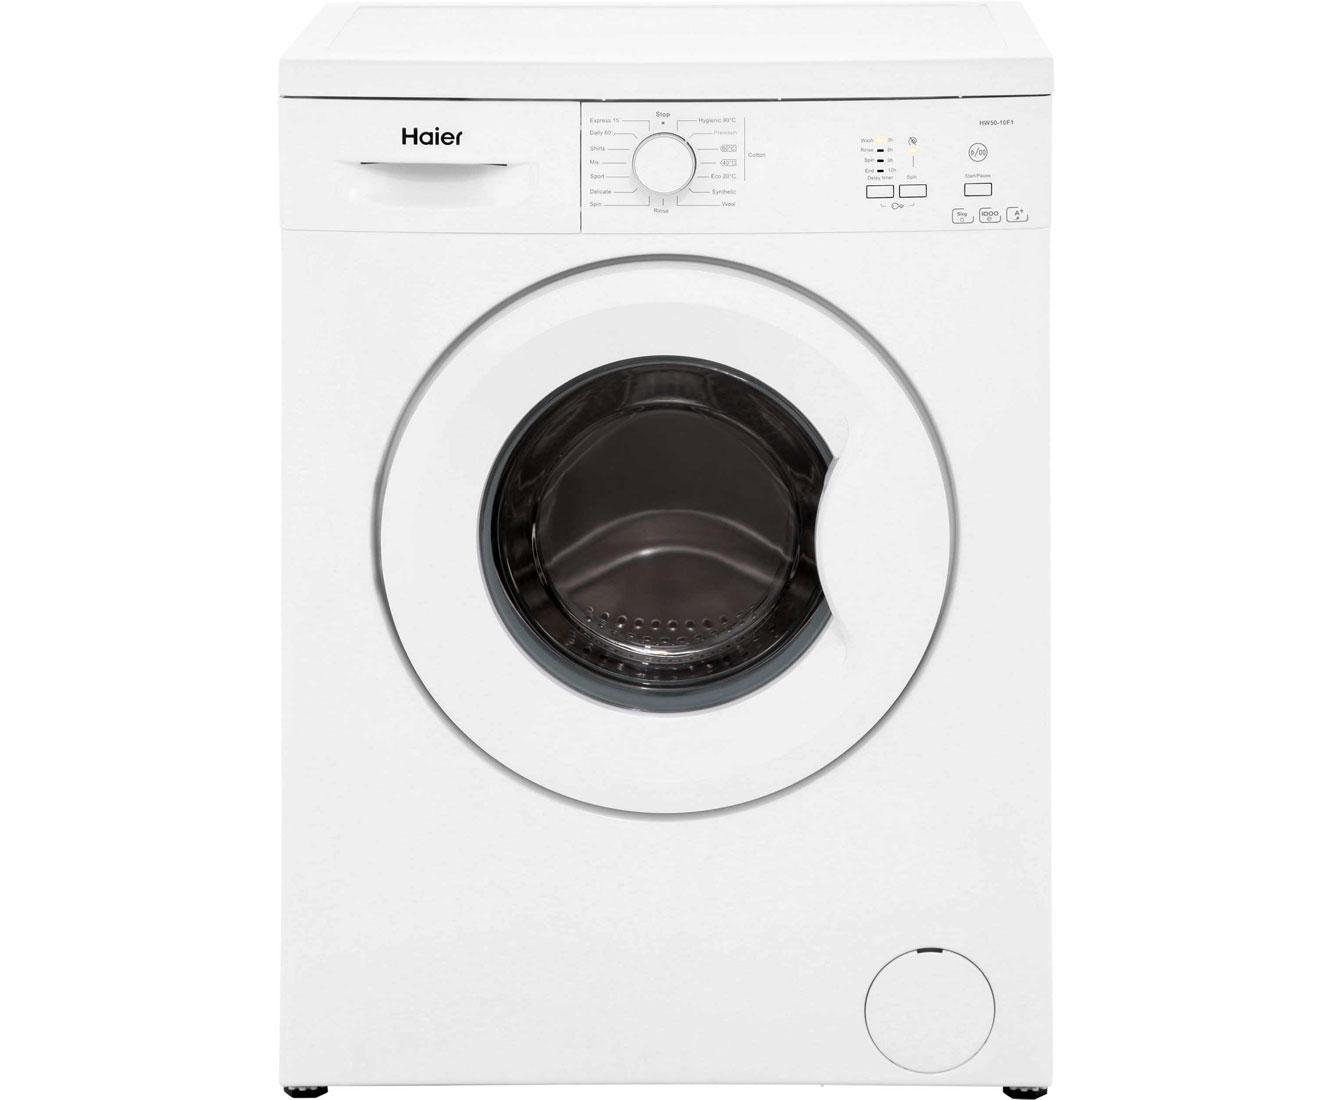 hec ew50 10f1 waschmaschine a 1000 u min 5 kg neu. Black Bedroom Furniture Sets. Home Design Ideas